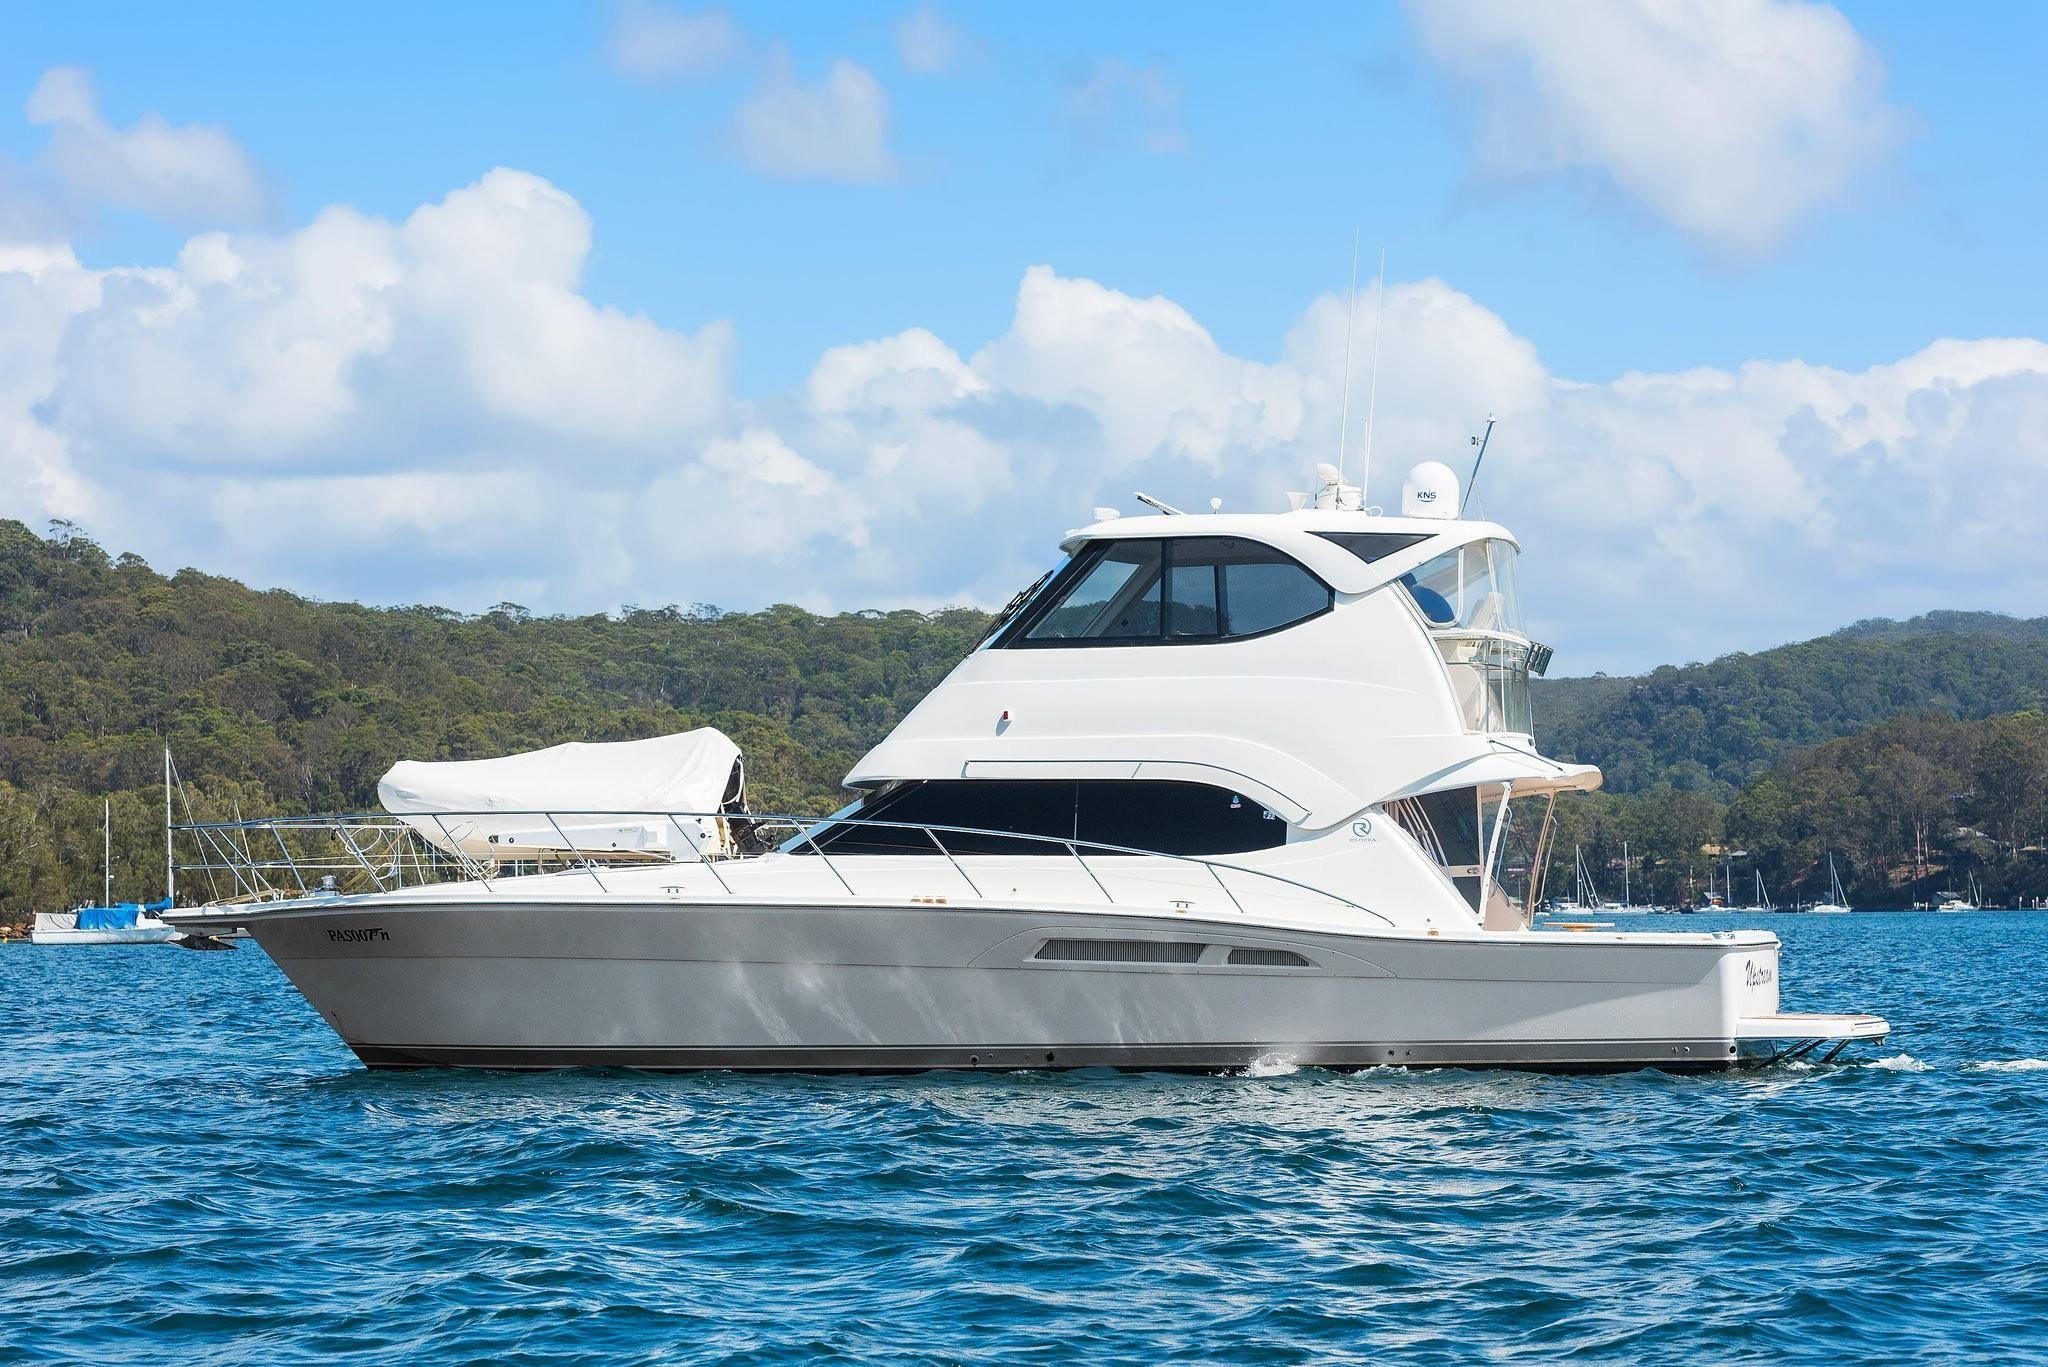 2009 Riviera 47 Enclosed Flybridge Series II Power Boat For Sale -